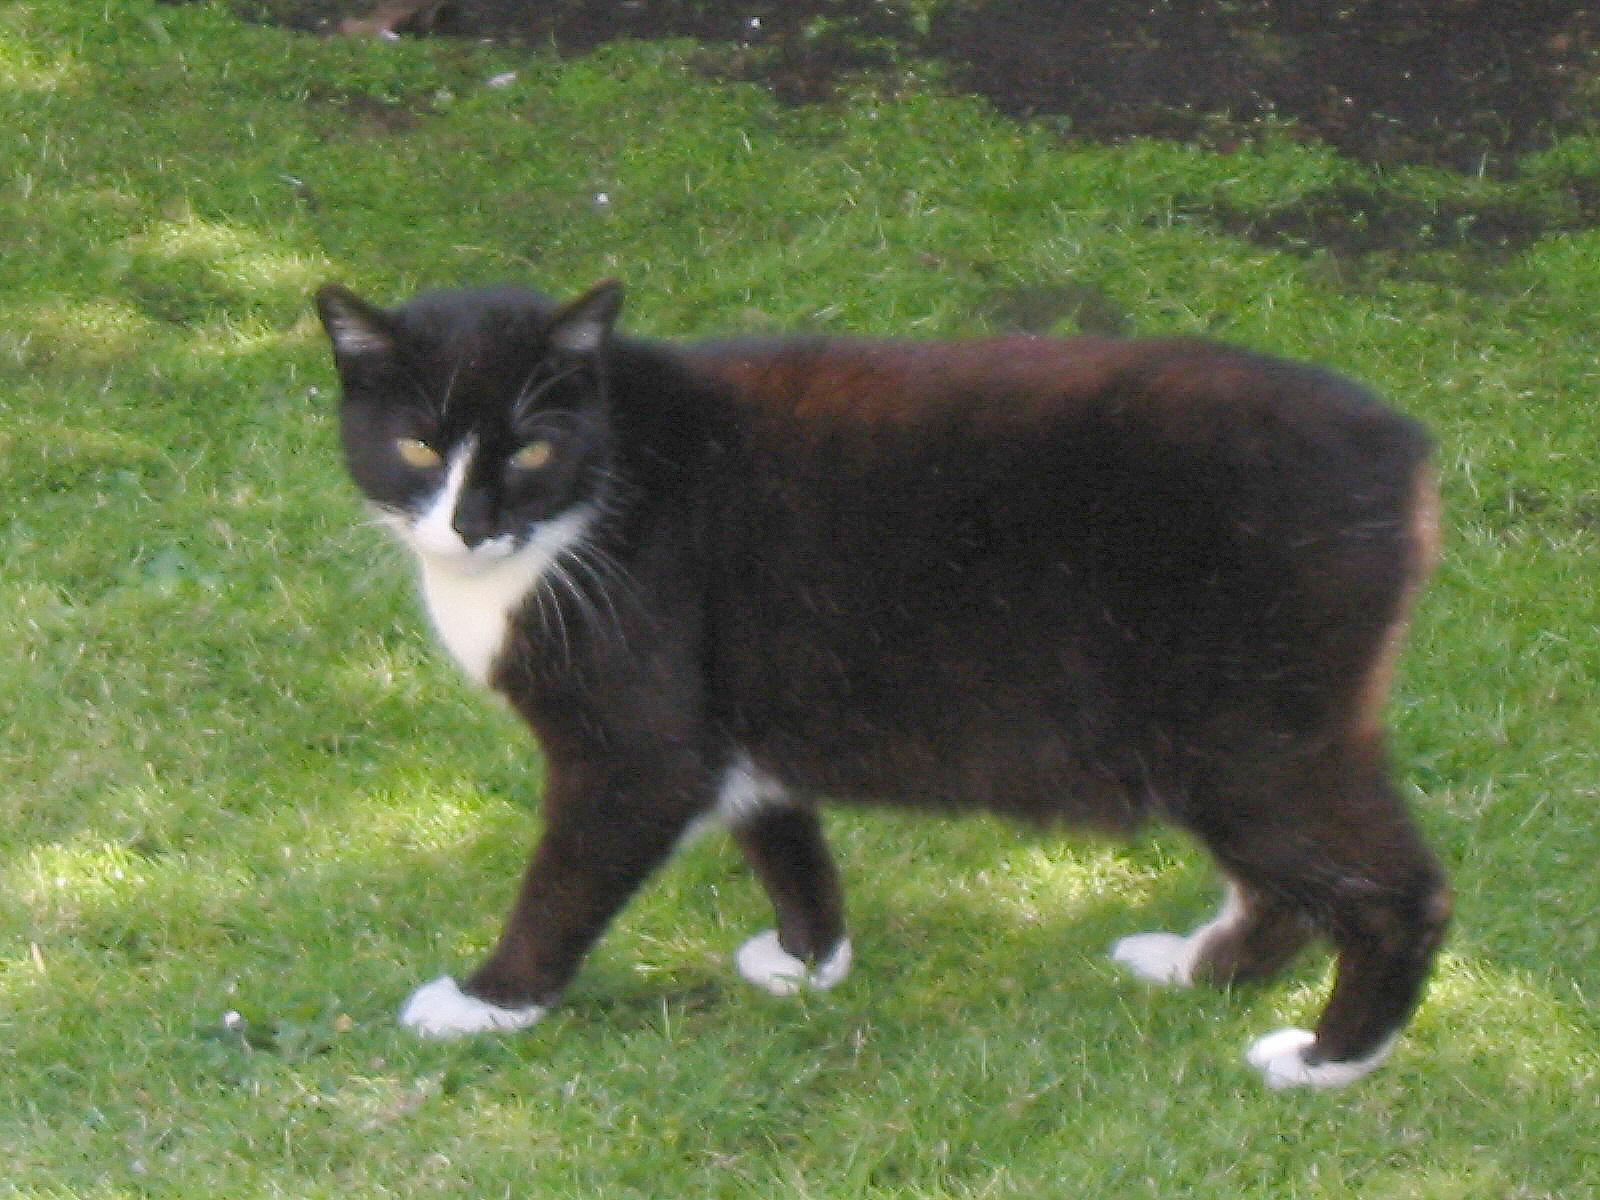 Manx Cat Breed | Facts, Highlights & Buying Advice ...  |Manx Cat History